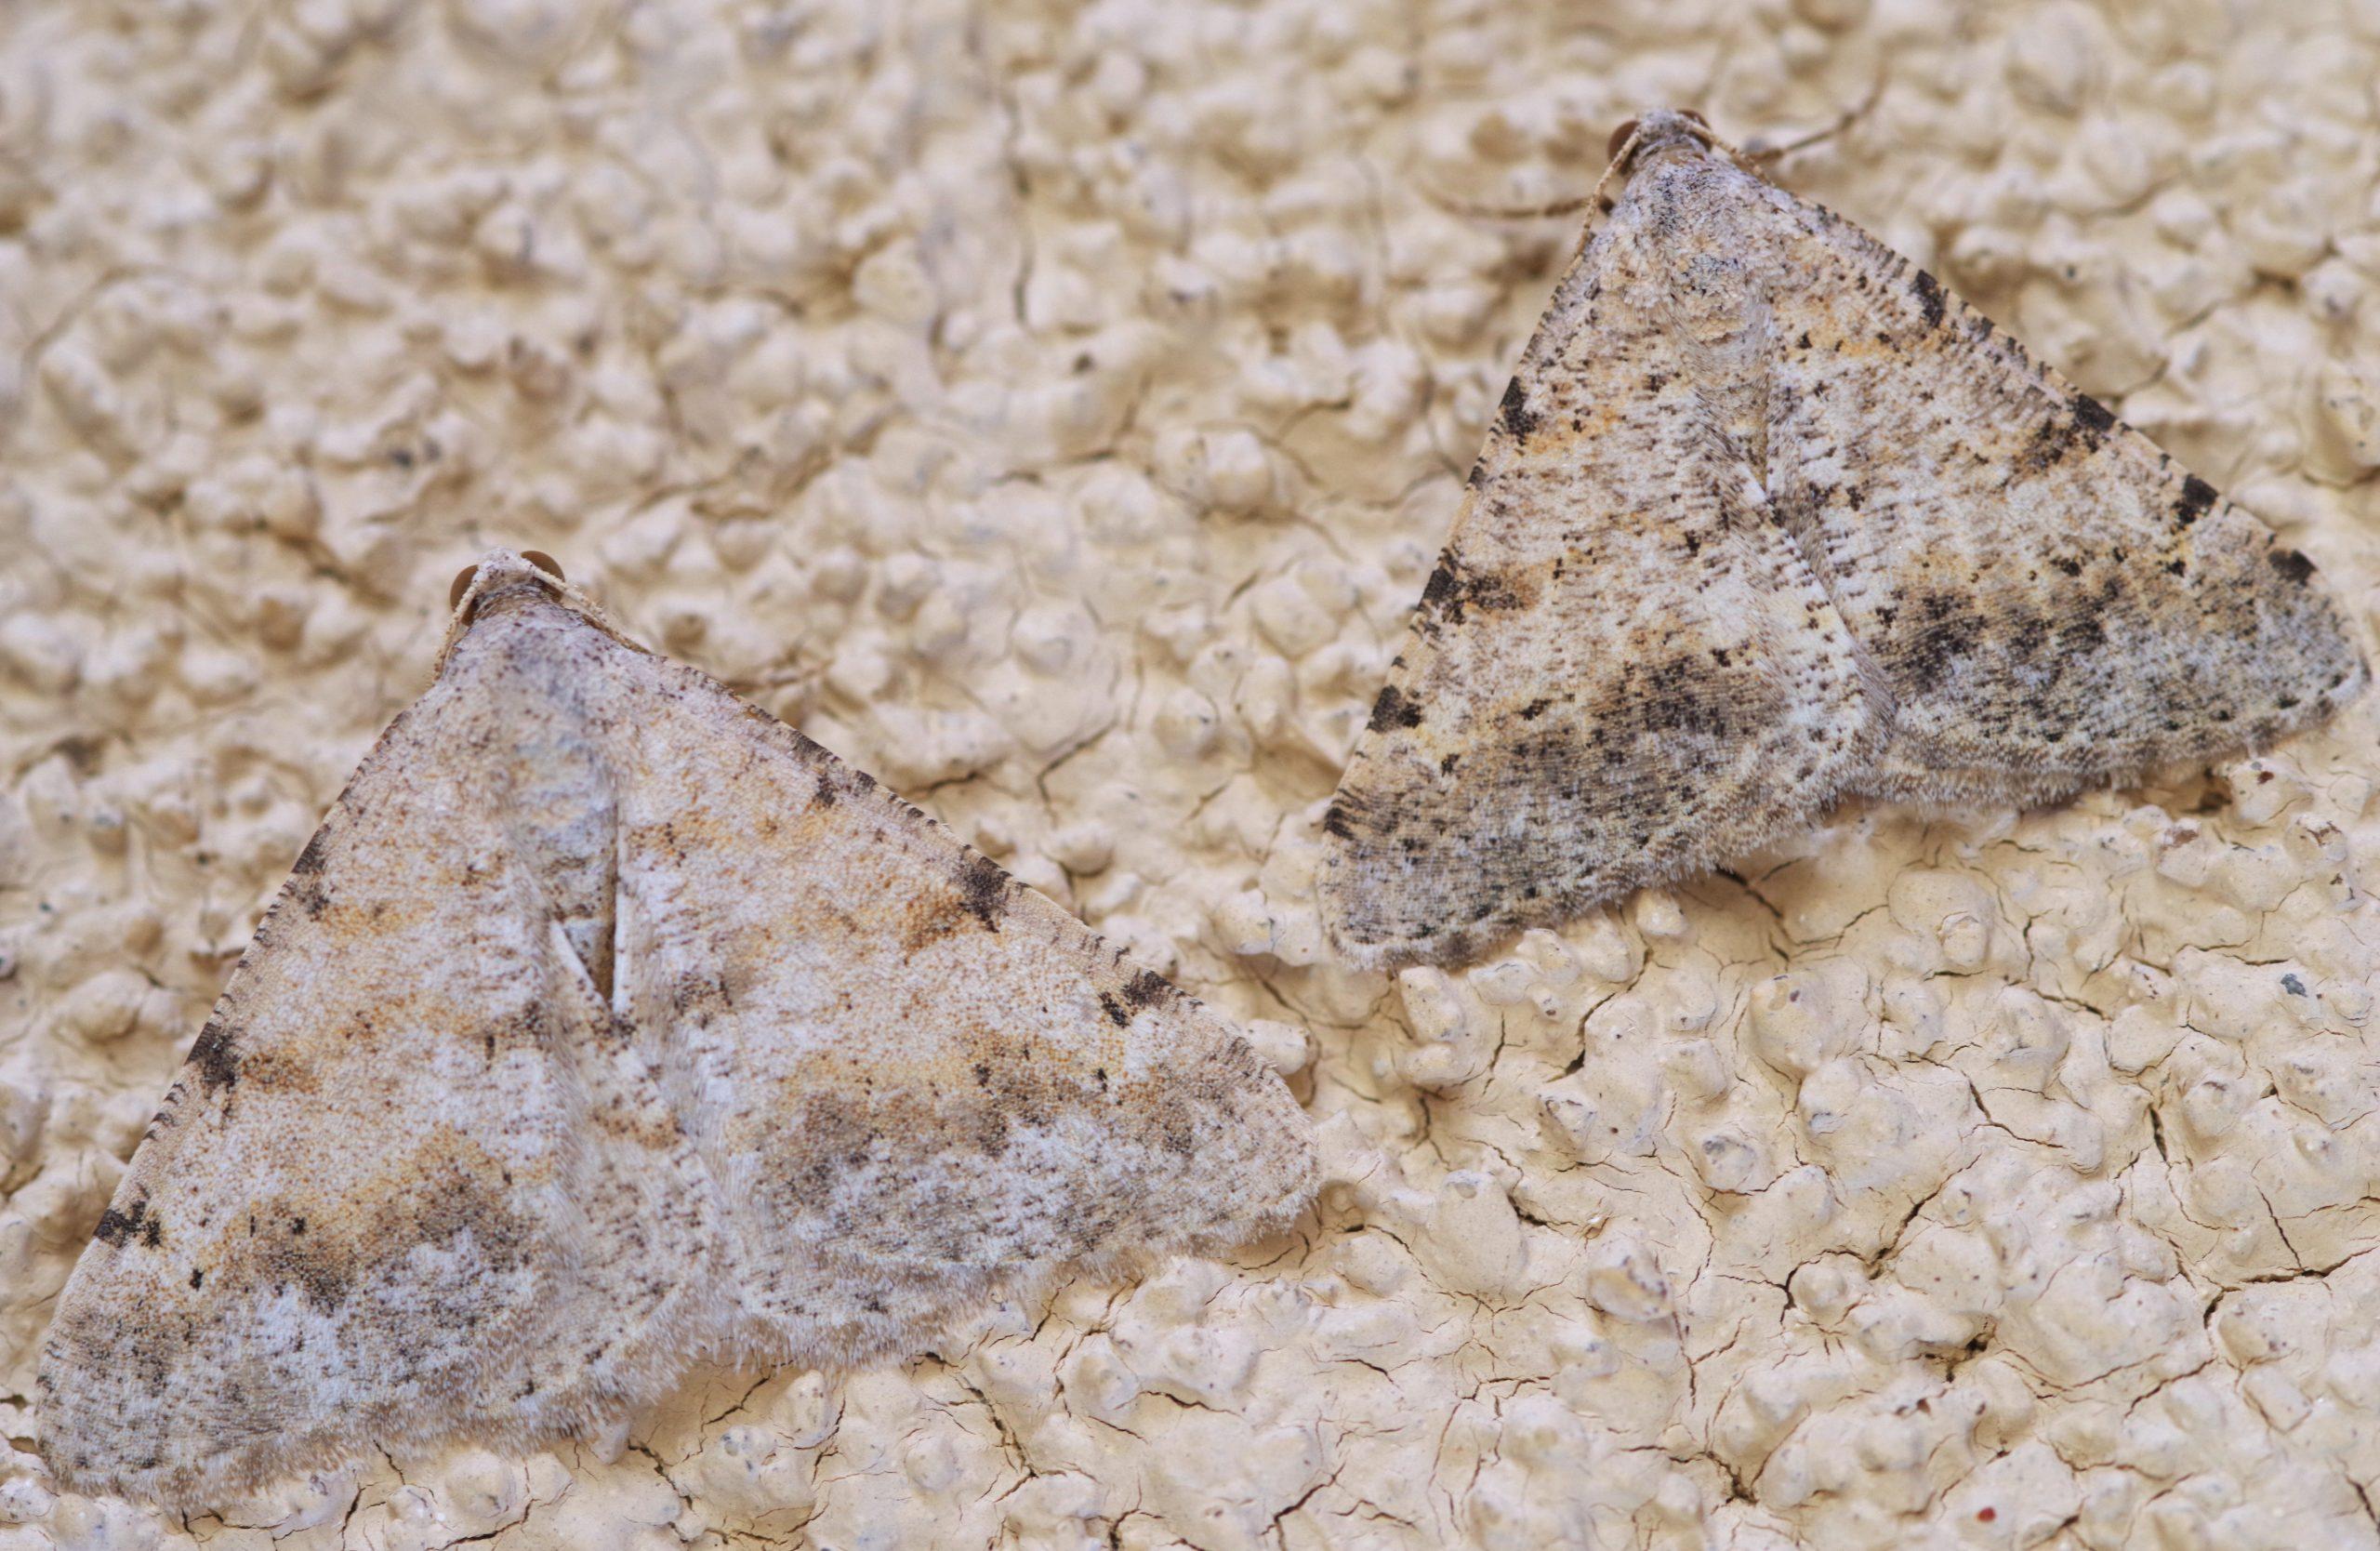 CREOSOTE MOTH, Digrammia colorata. Photo by Paul De Ley.